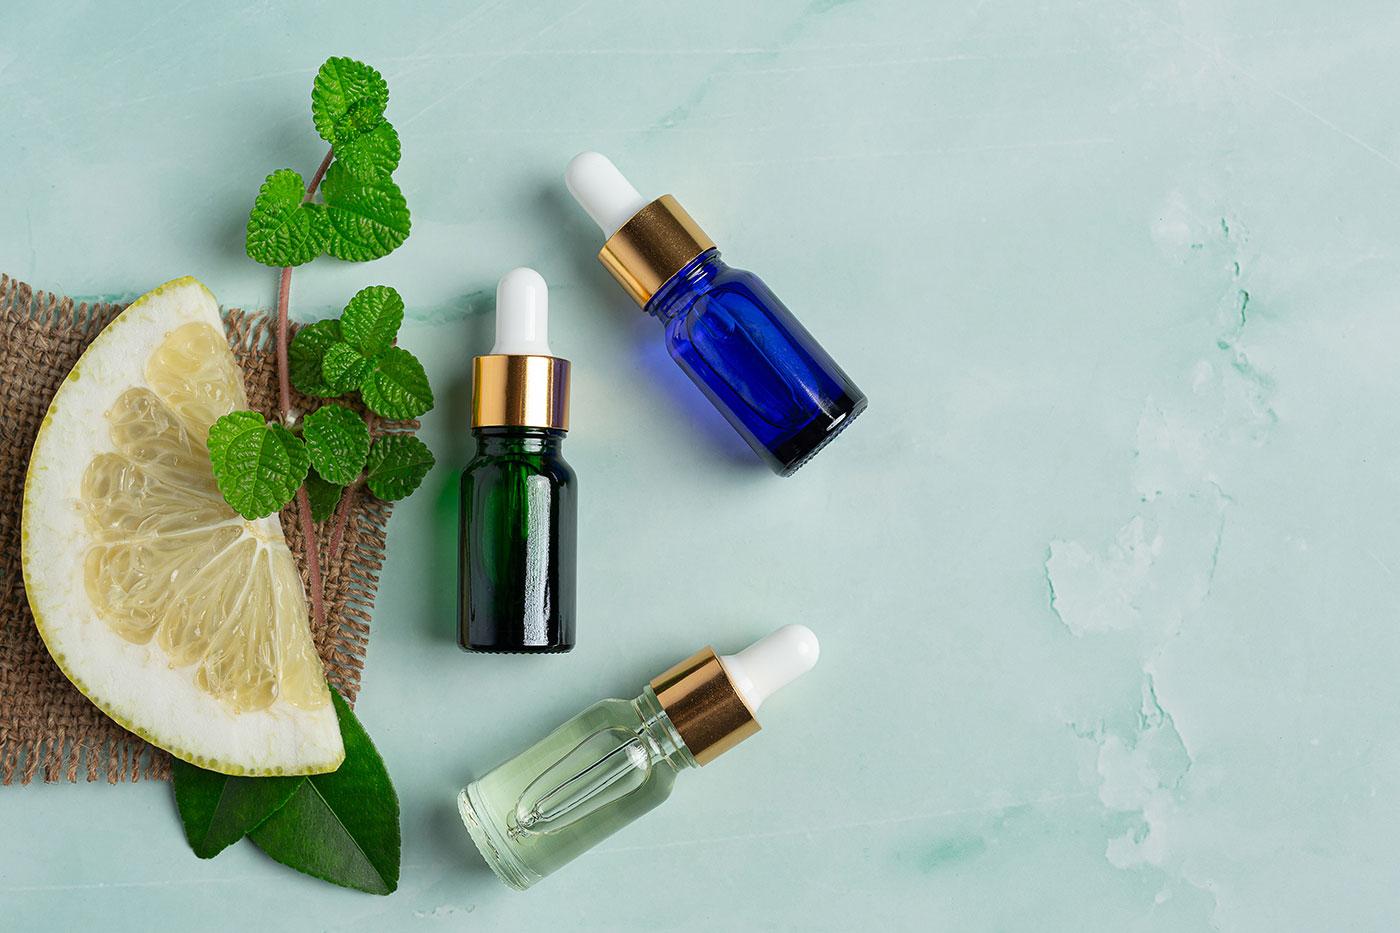 Haappy Herbs – A popular, clean skin care brand